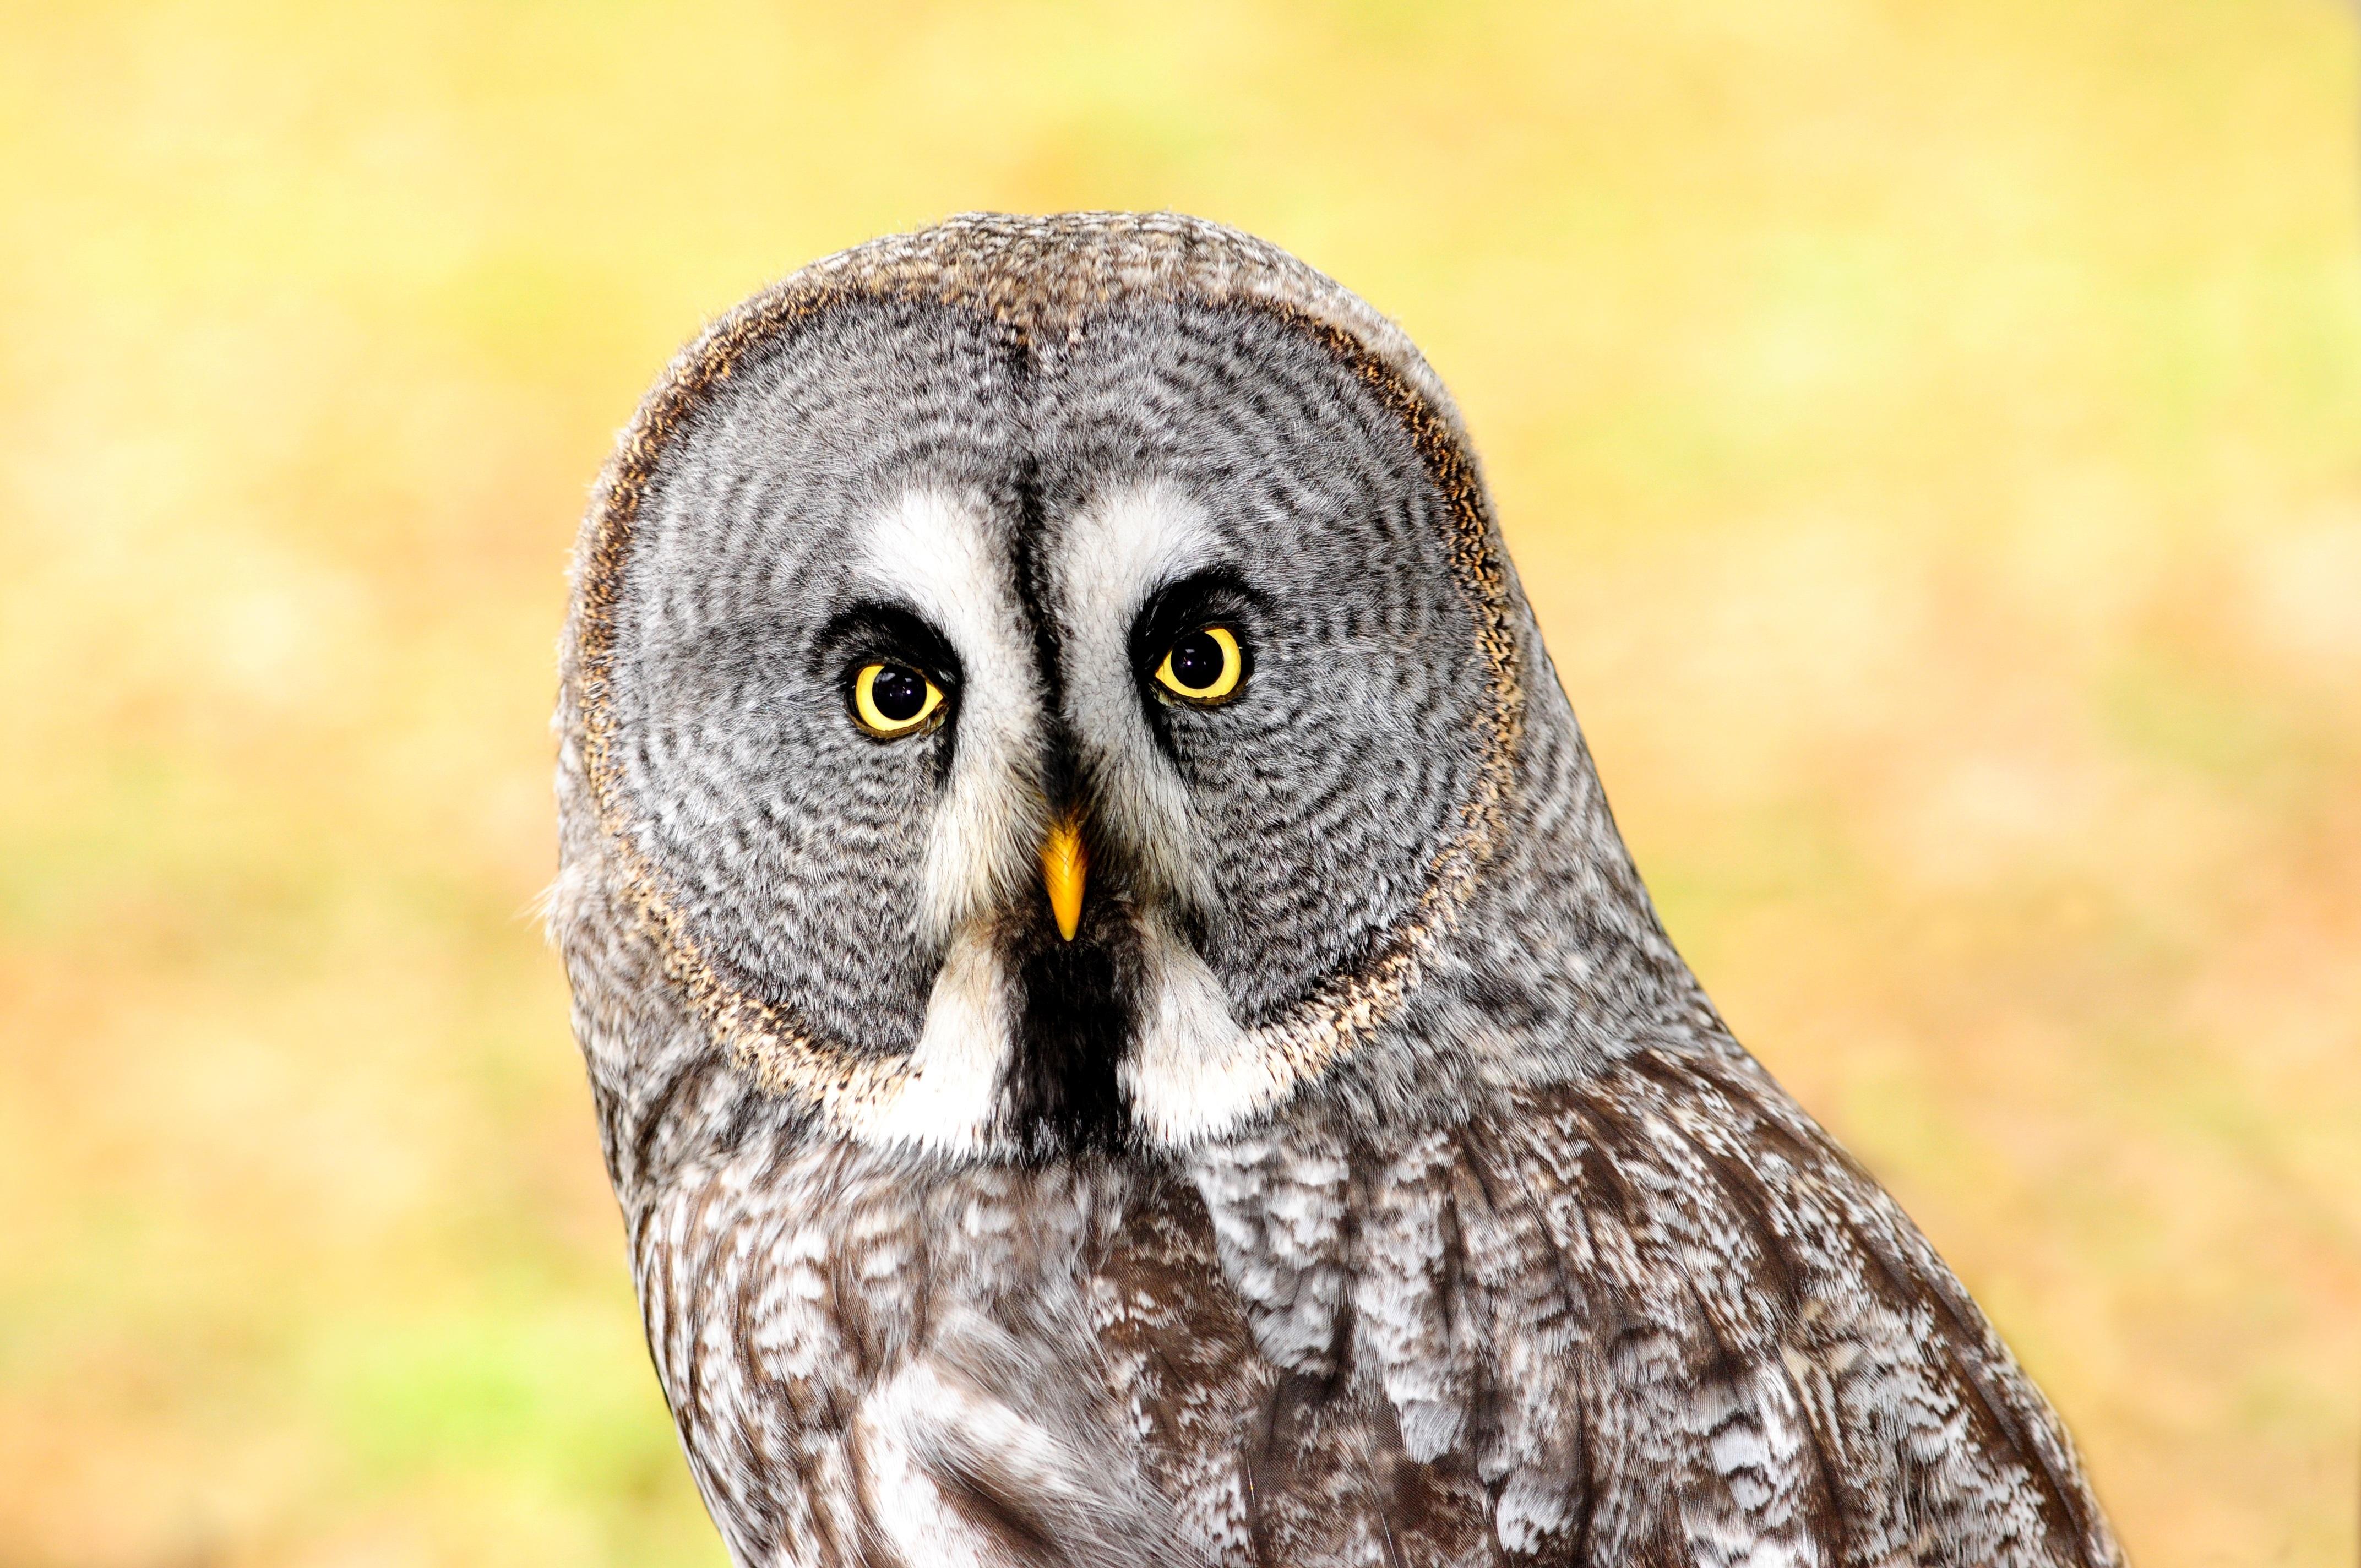 free images wing wildlife beak fauna bird of prey close up